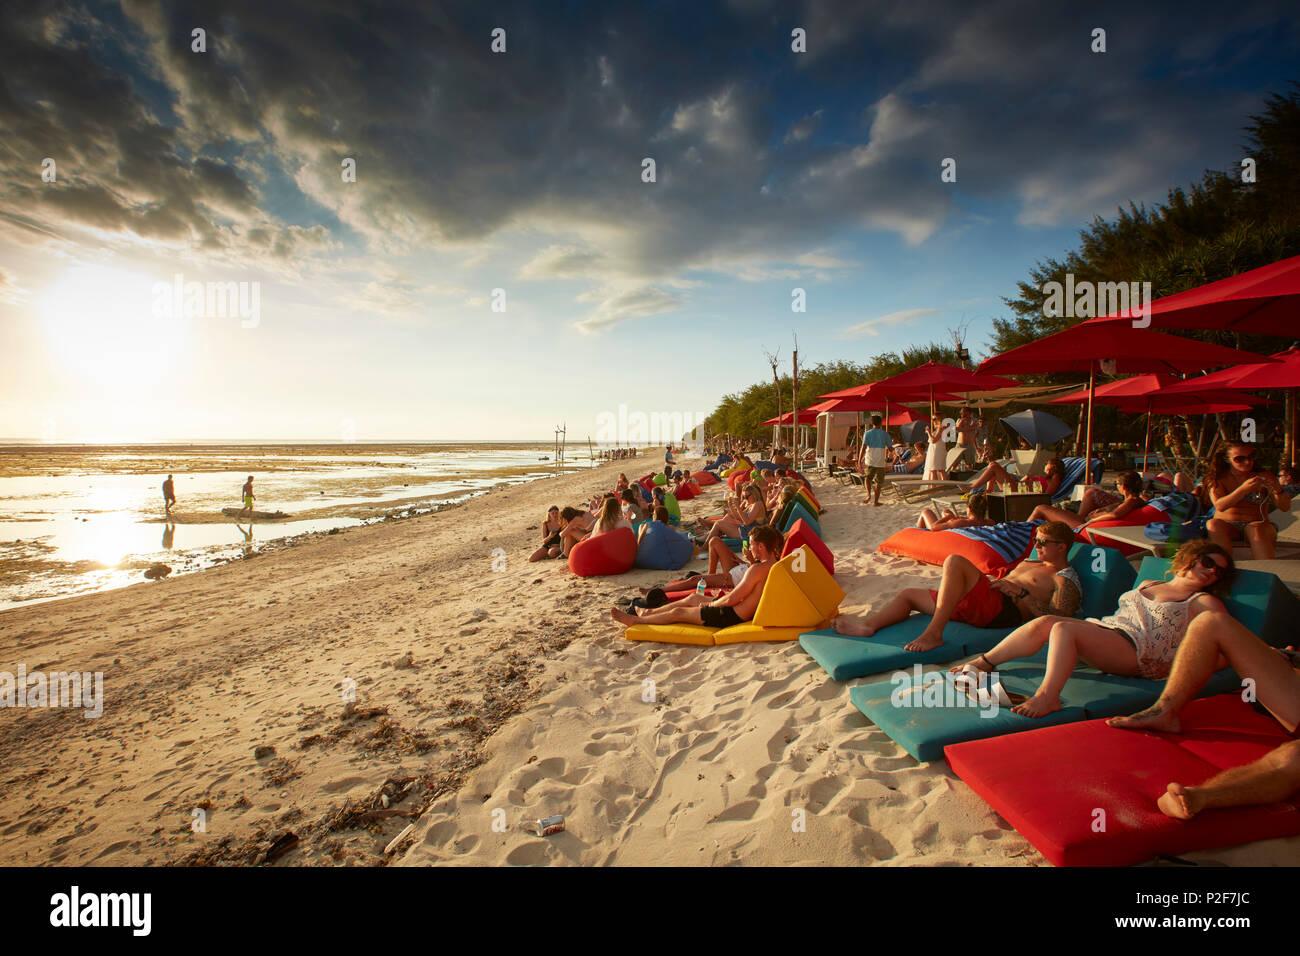 Invités dans un bar de plage, Gili Trawangan, Lombok, Indonésie Photo Stock